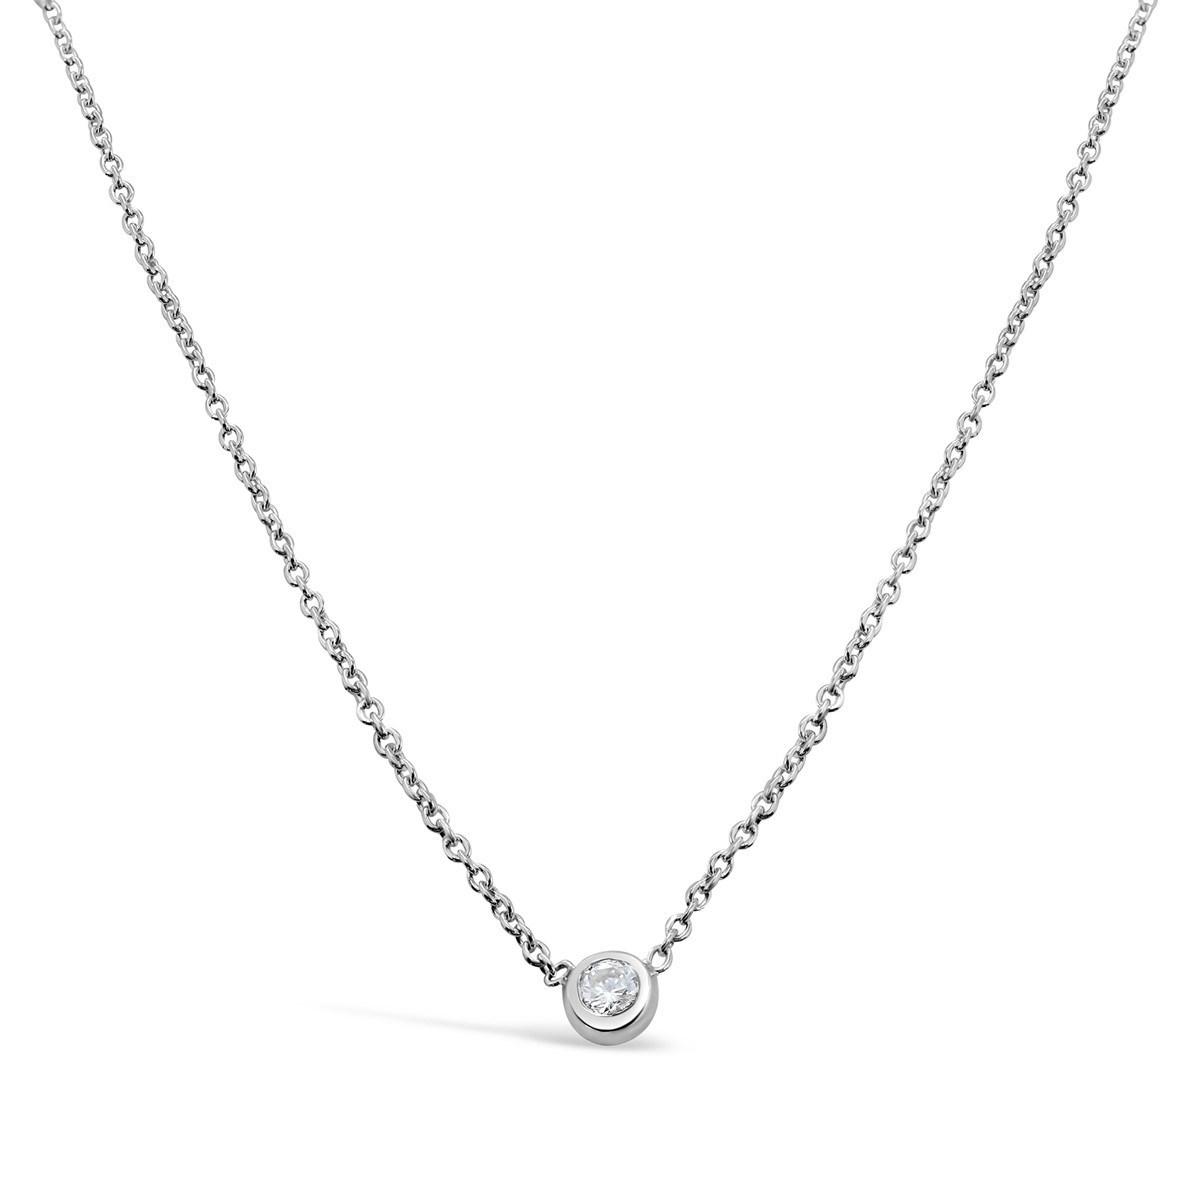 collier argent zirconium